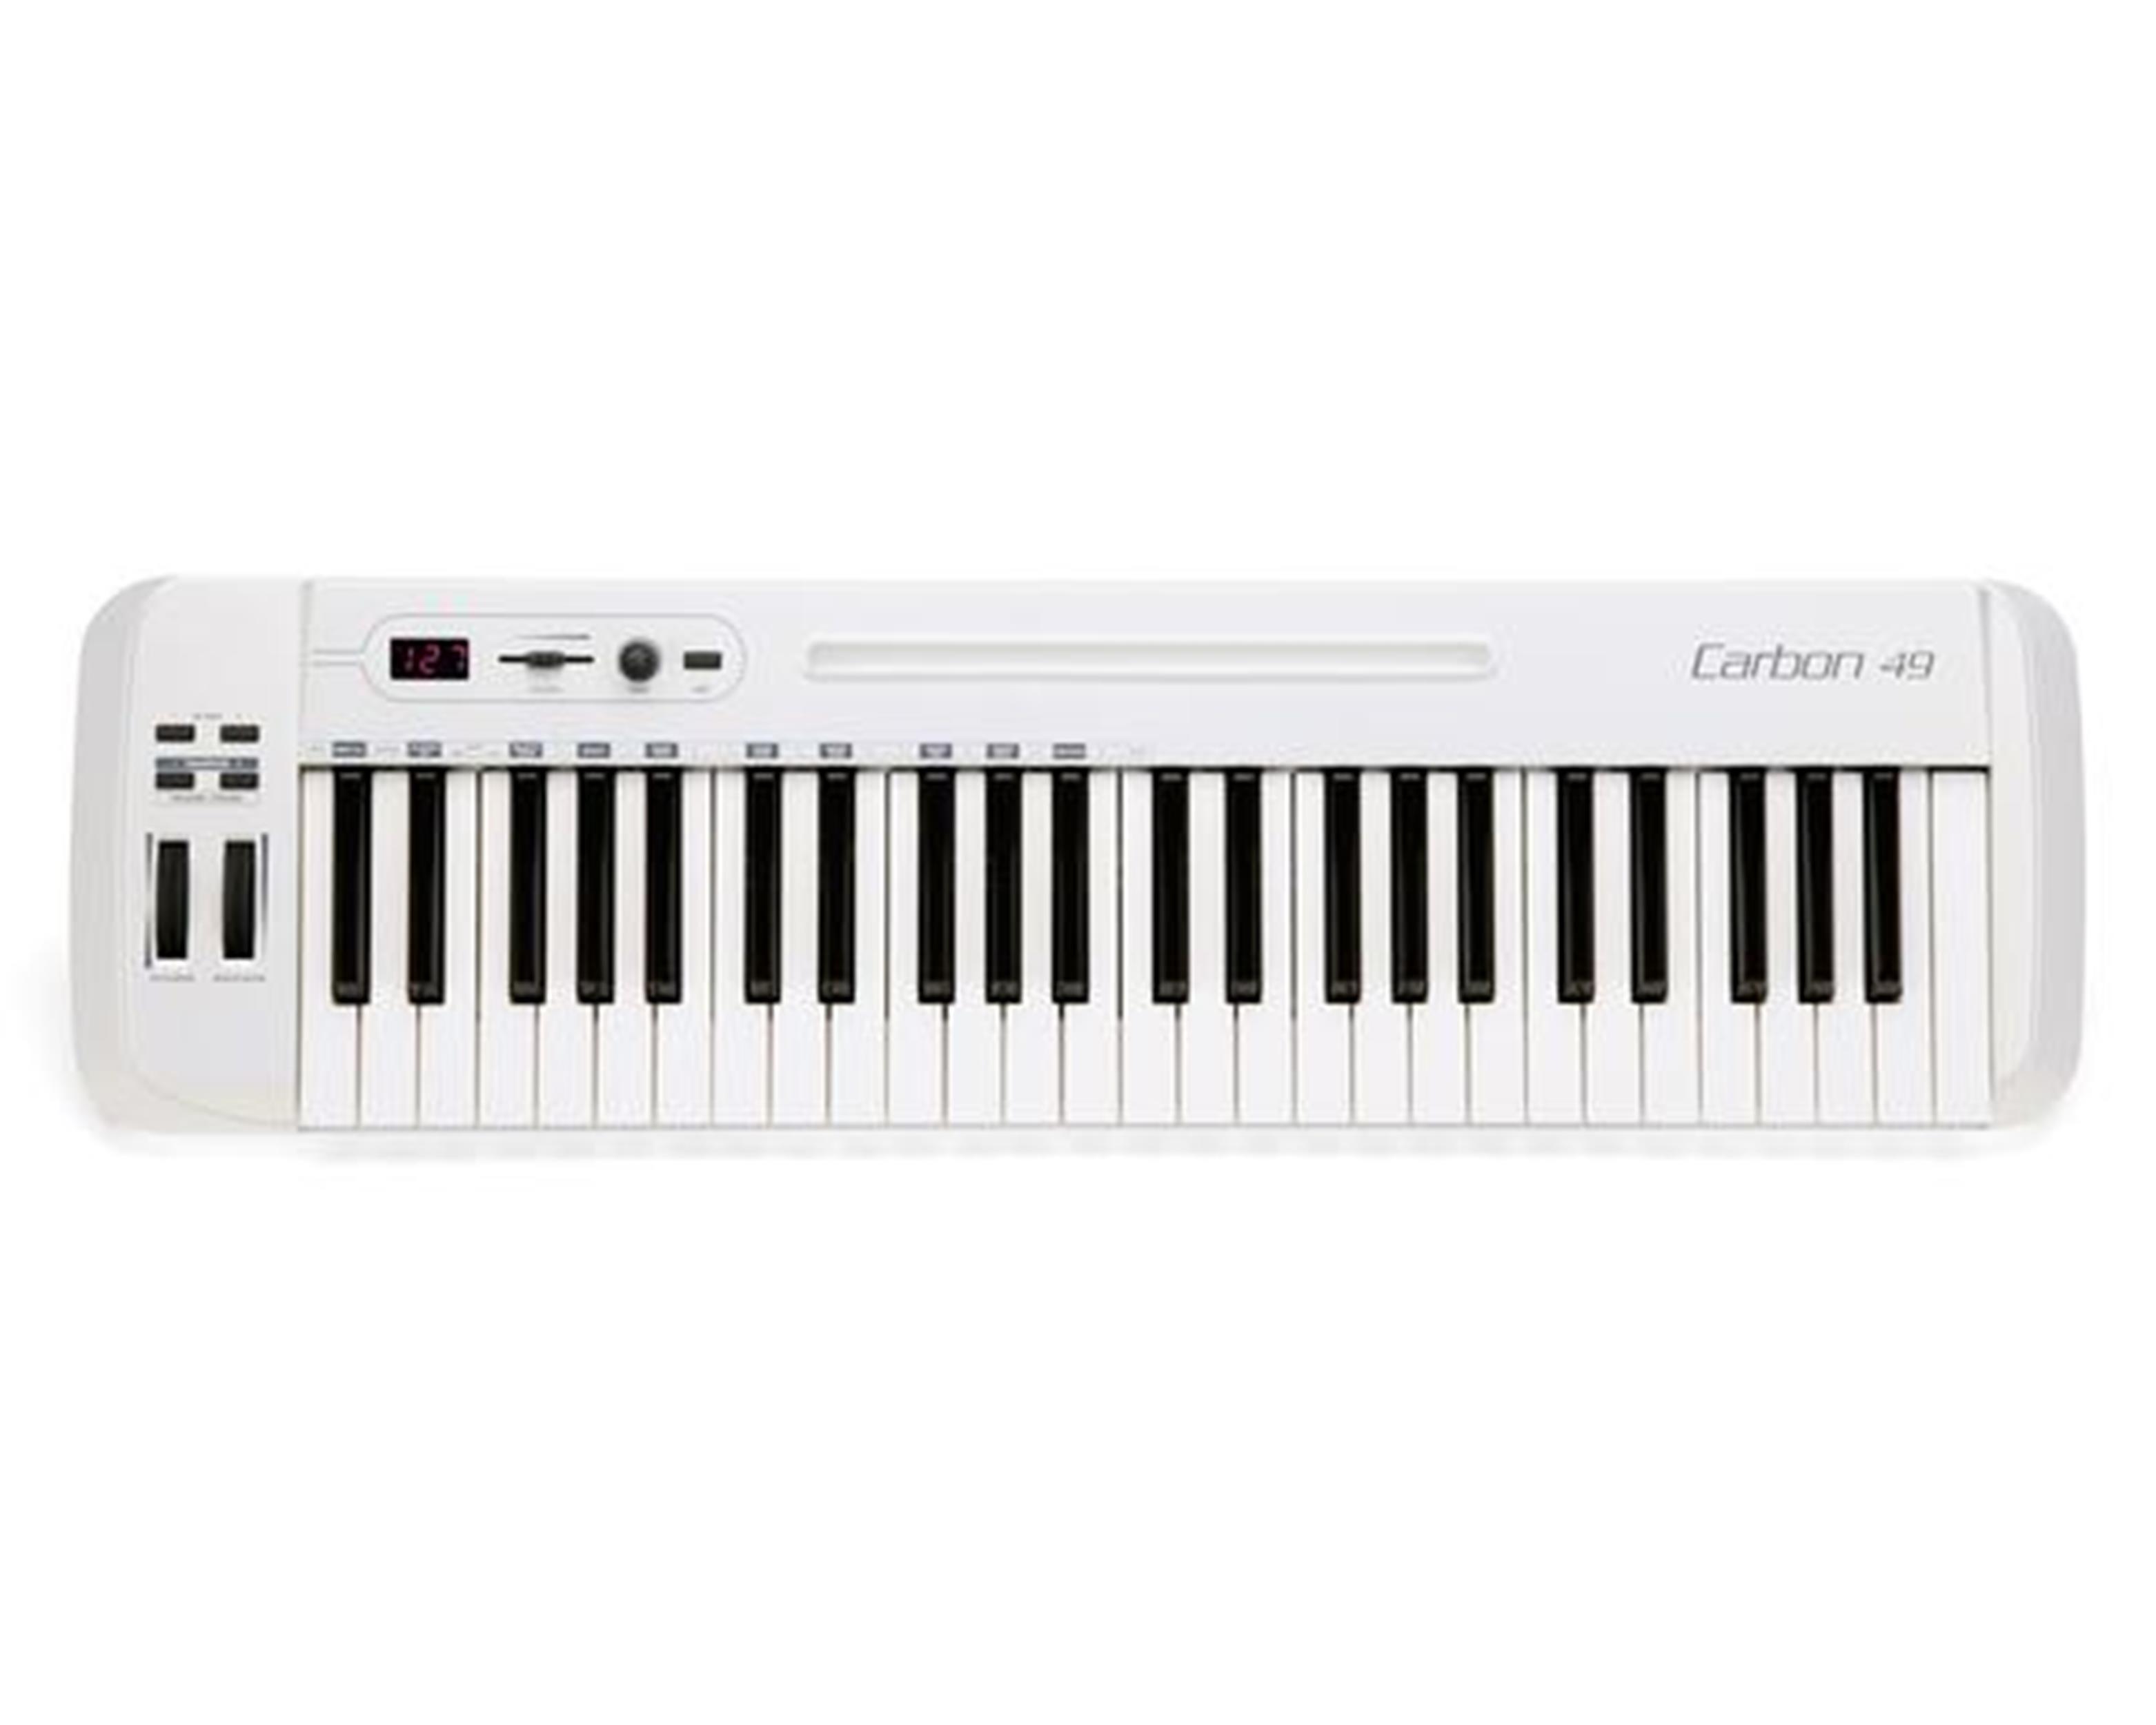 SAMSON-CARBON-49-MASTER-KEYBOARD-MIDI-Controller-USB-sku-10826